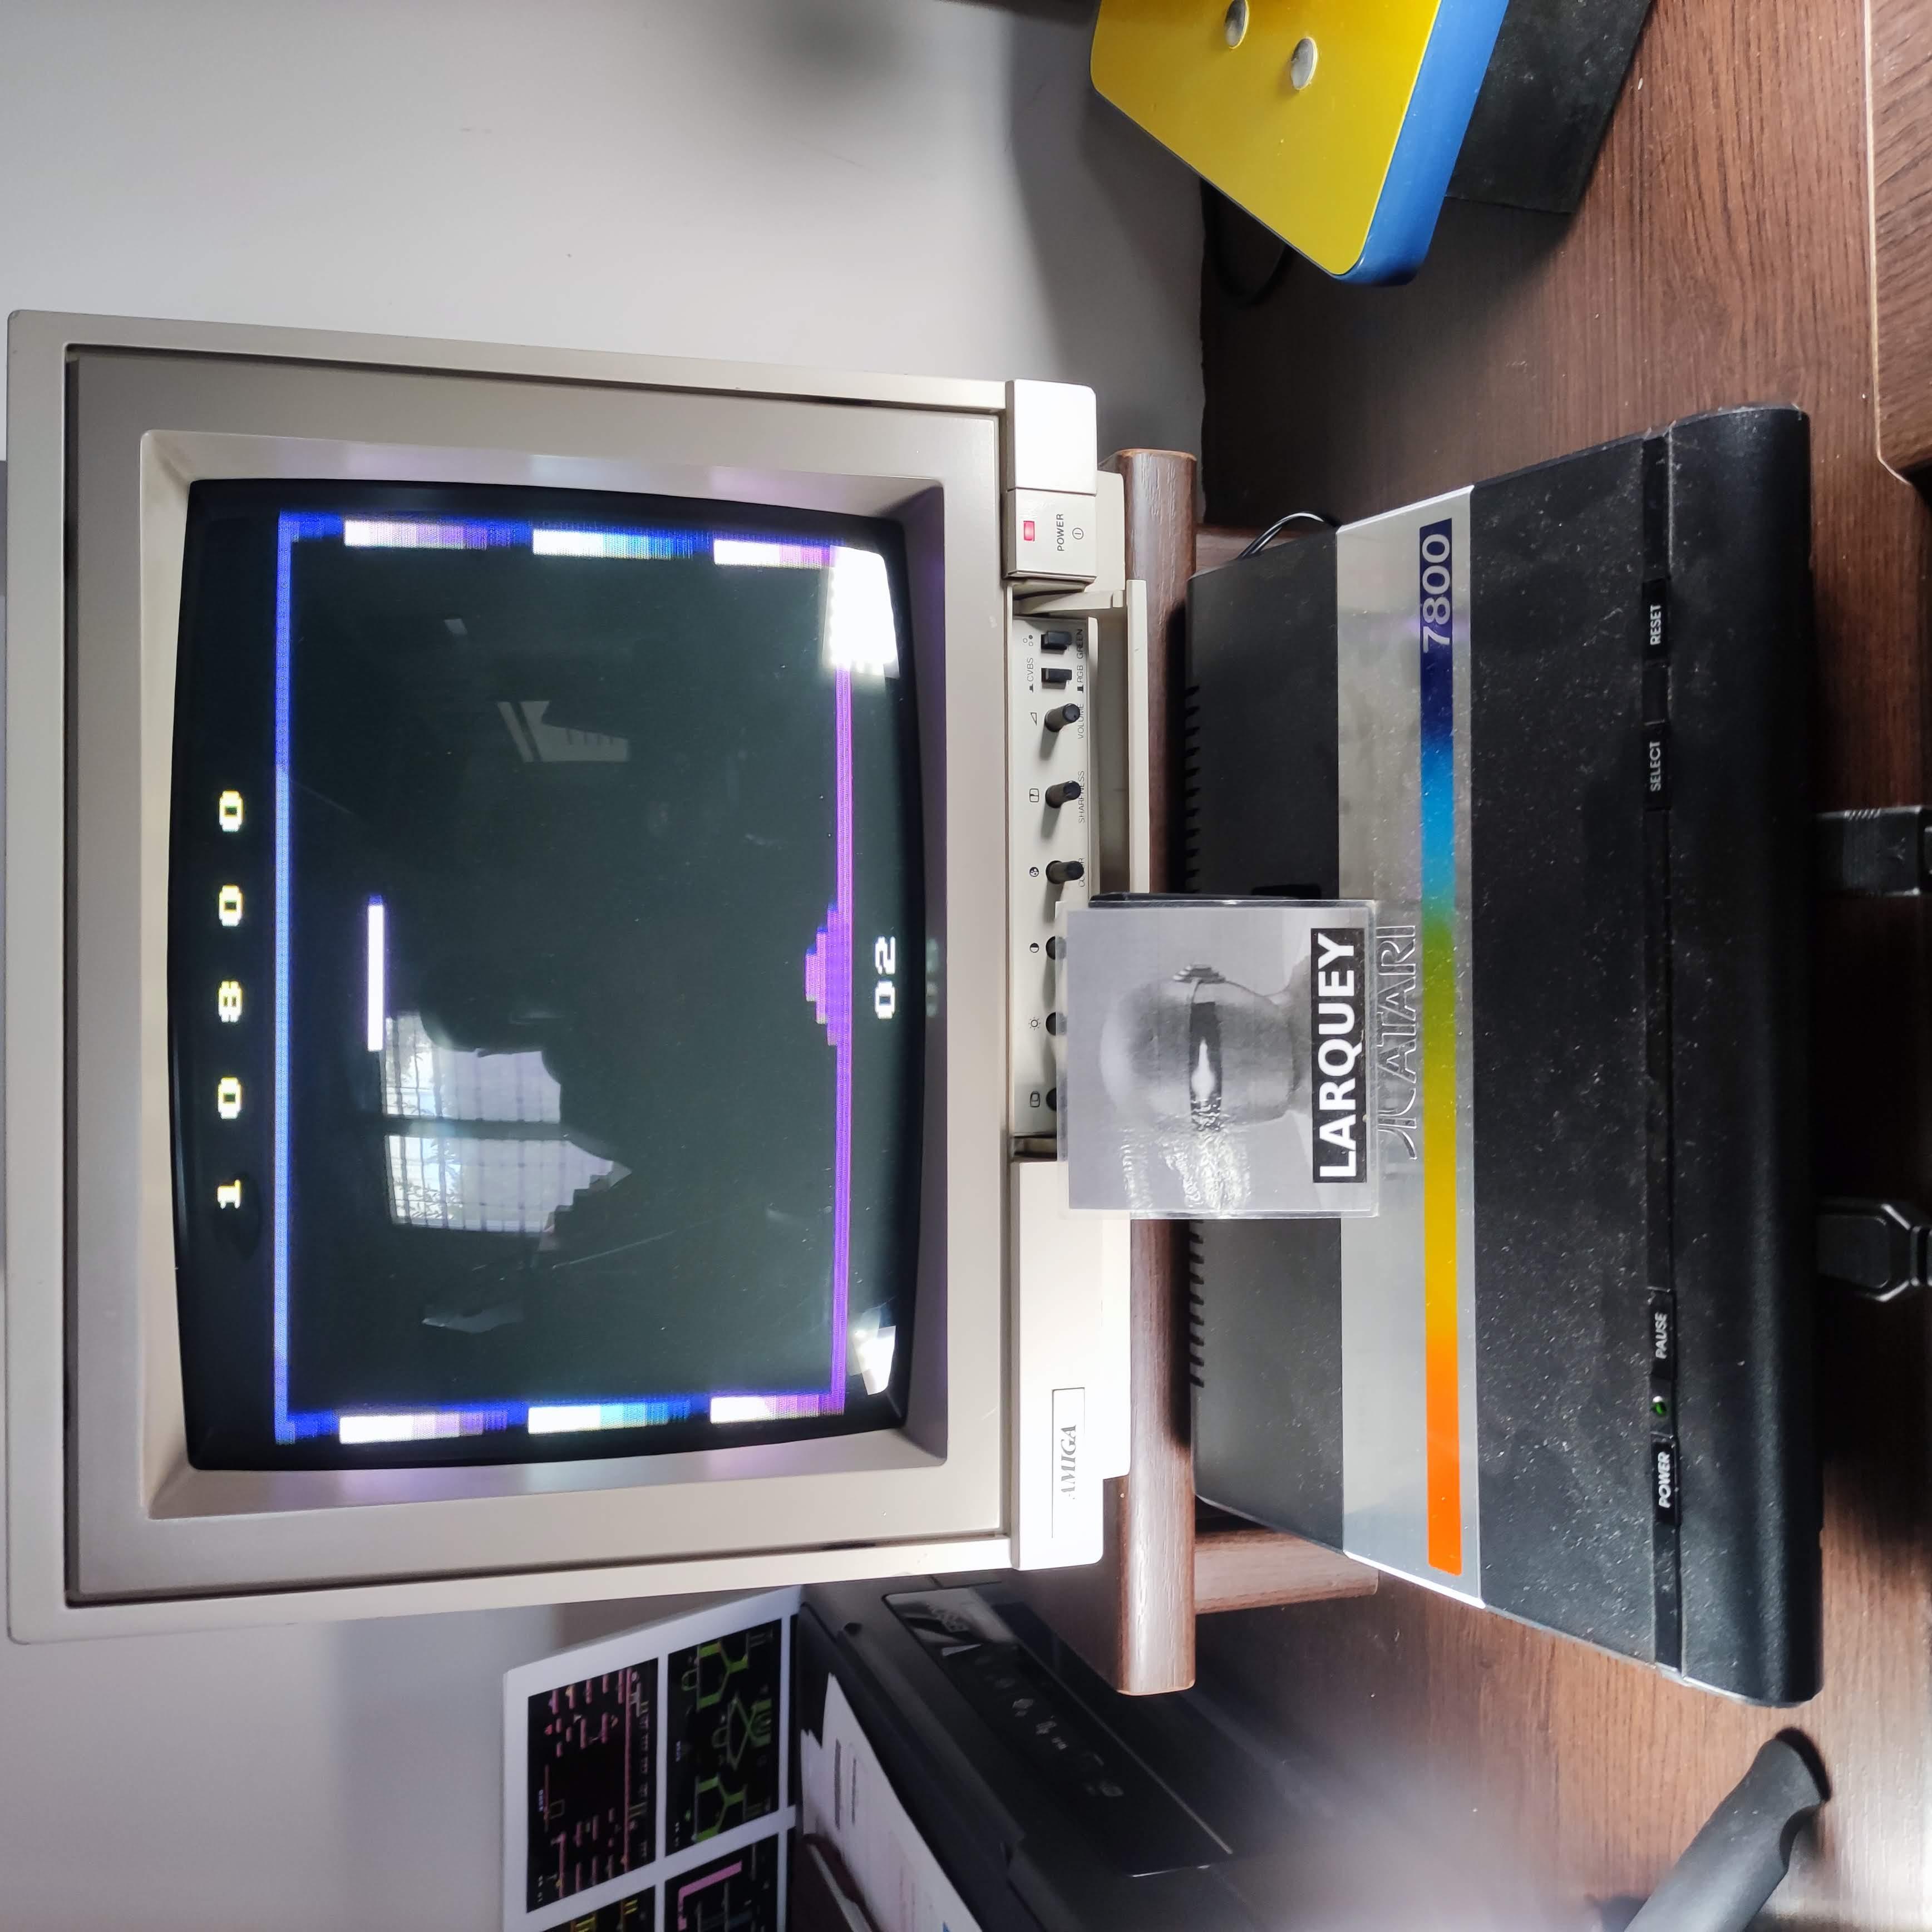 Larquey: Phantom Tank: Game 3 (Atari 2600) 10,800 points on 2020-10-12 12:15:25